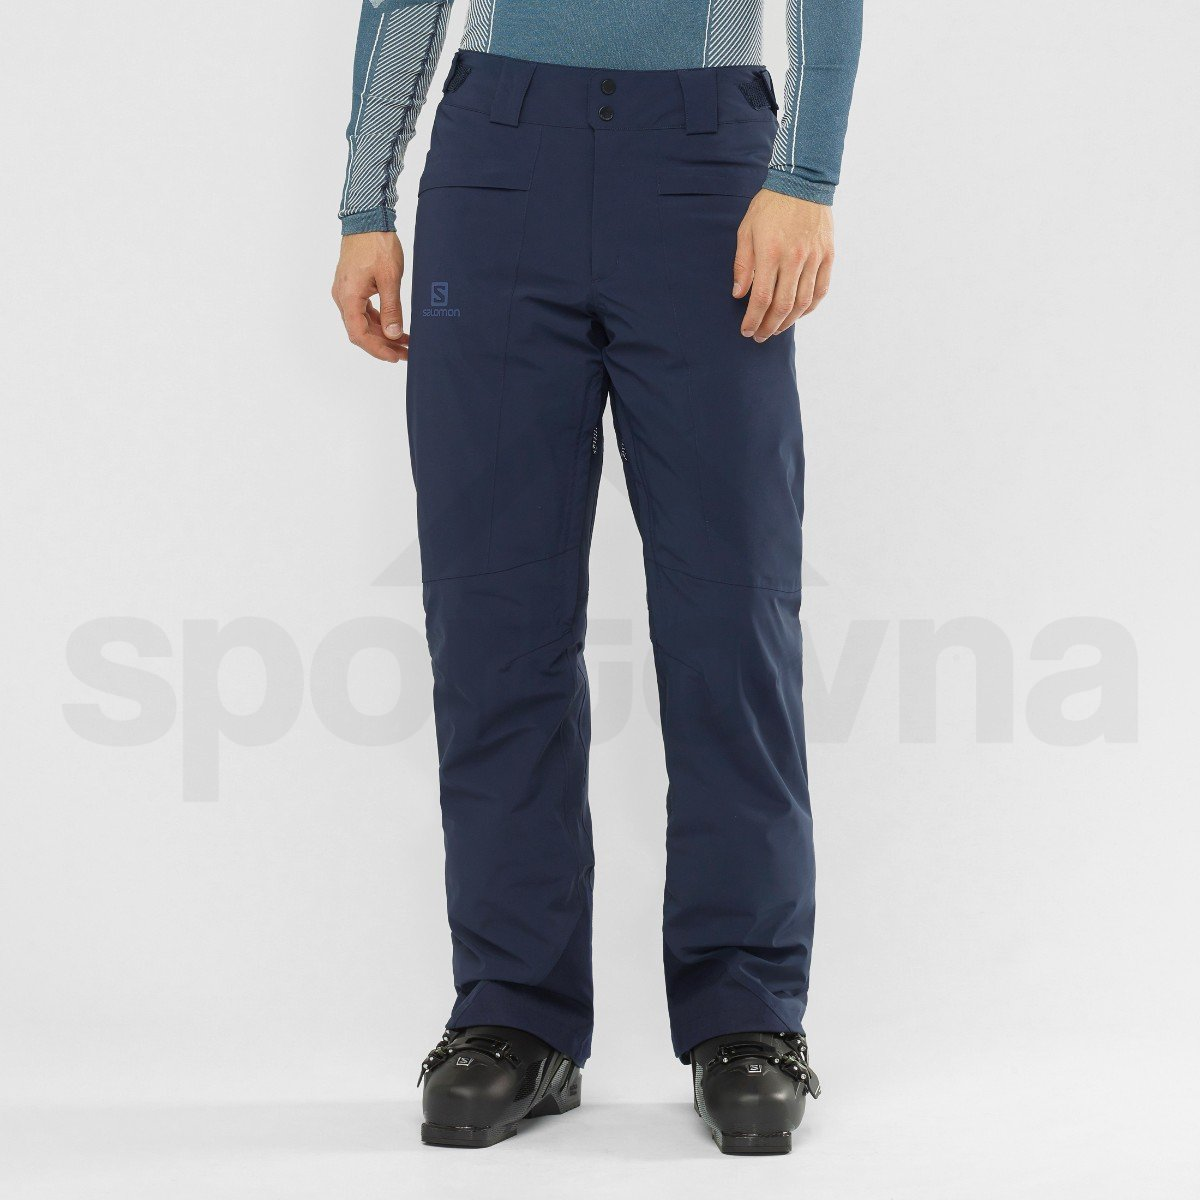 Kalhoty Salomon BRILLIANT PANT M - modrá